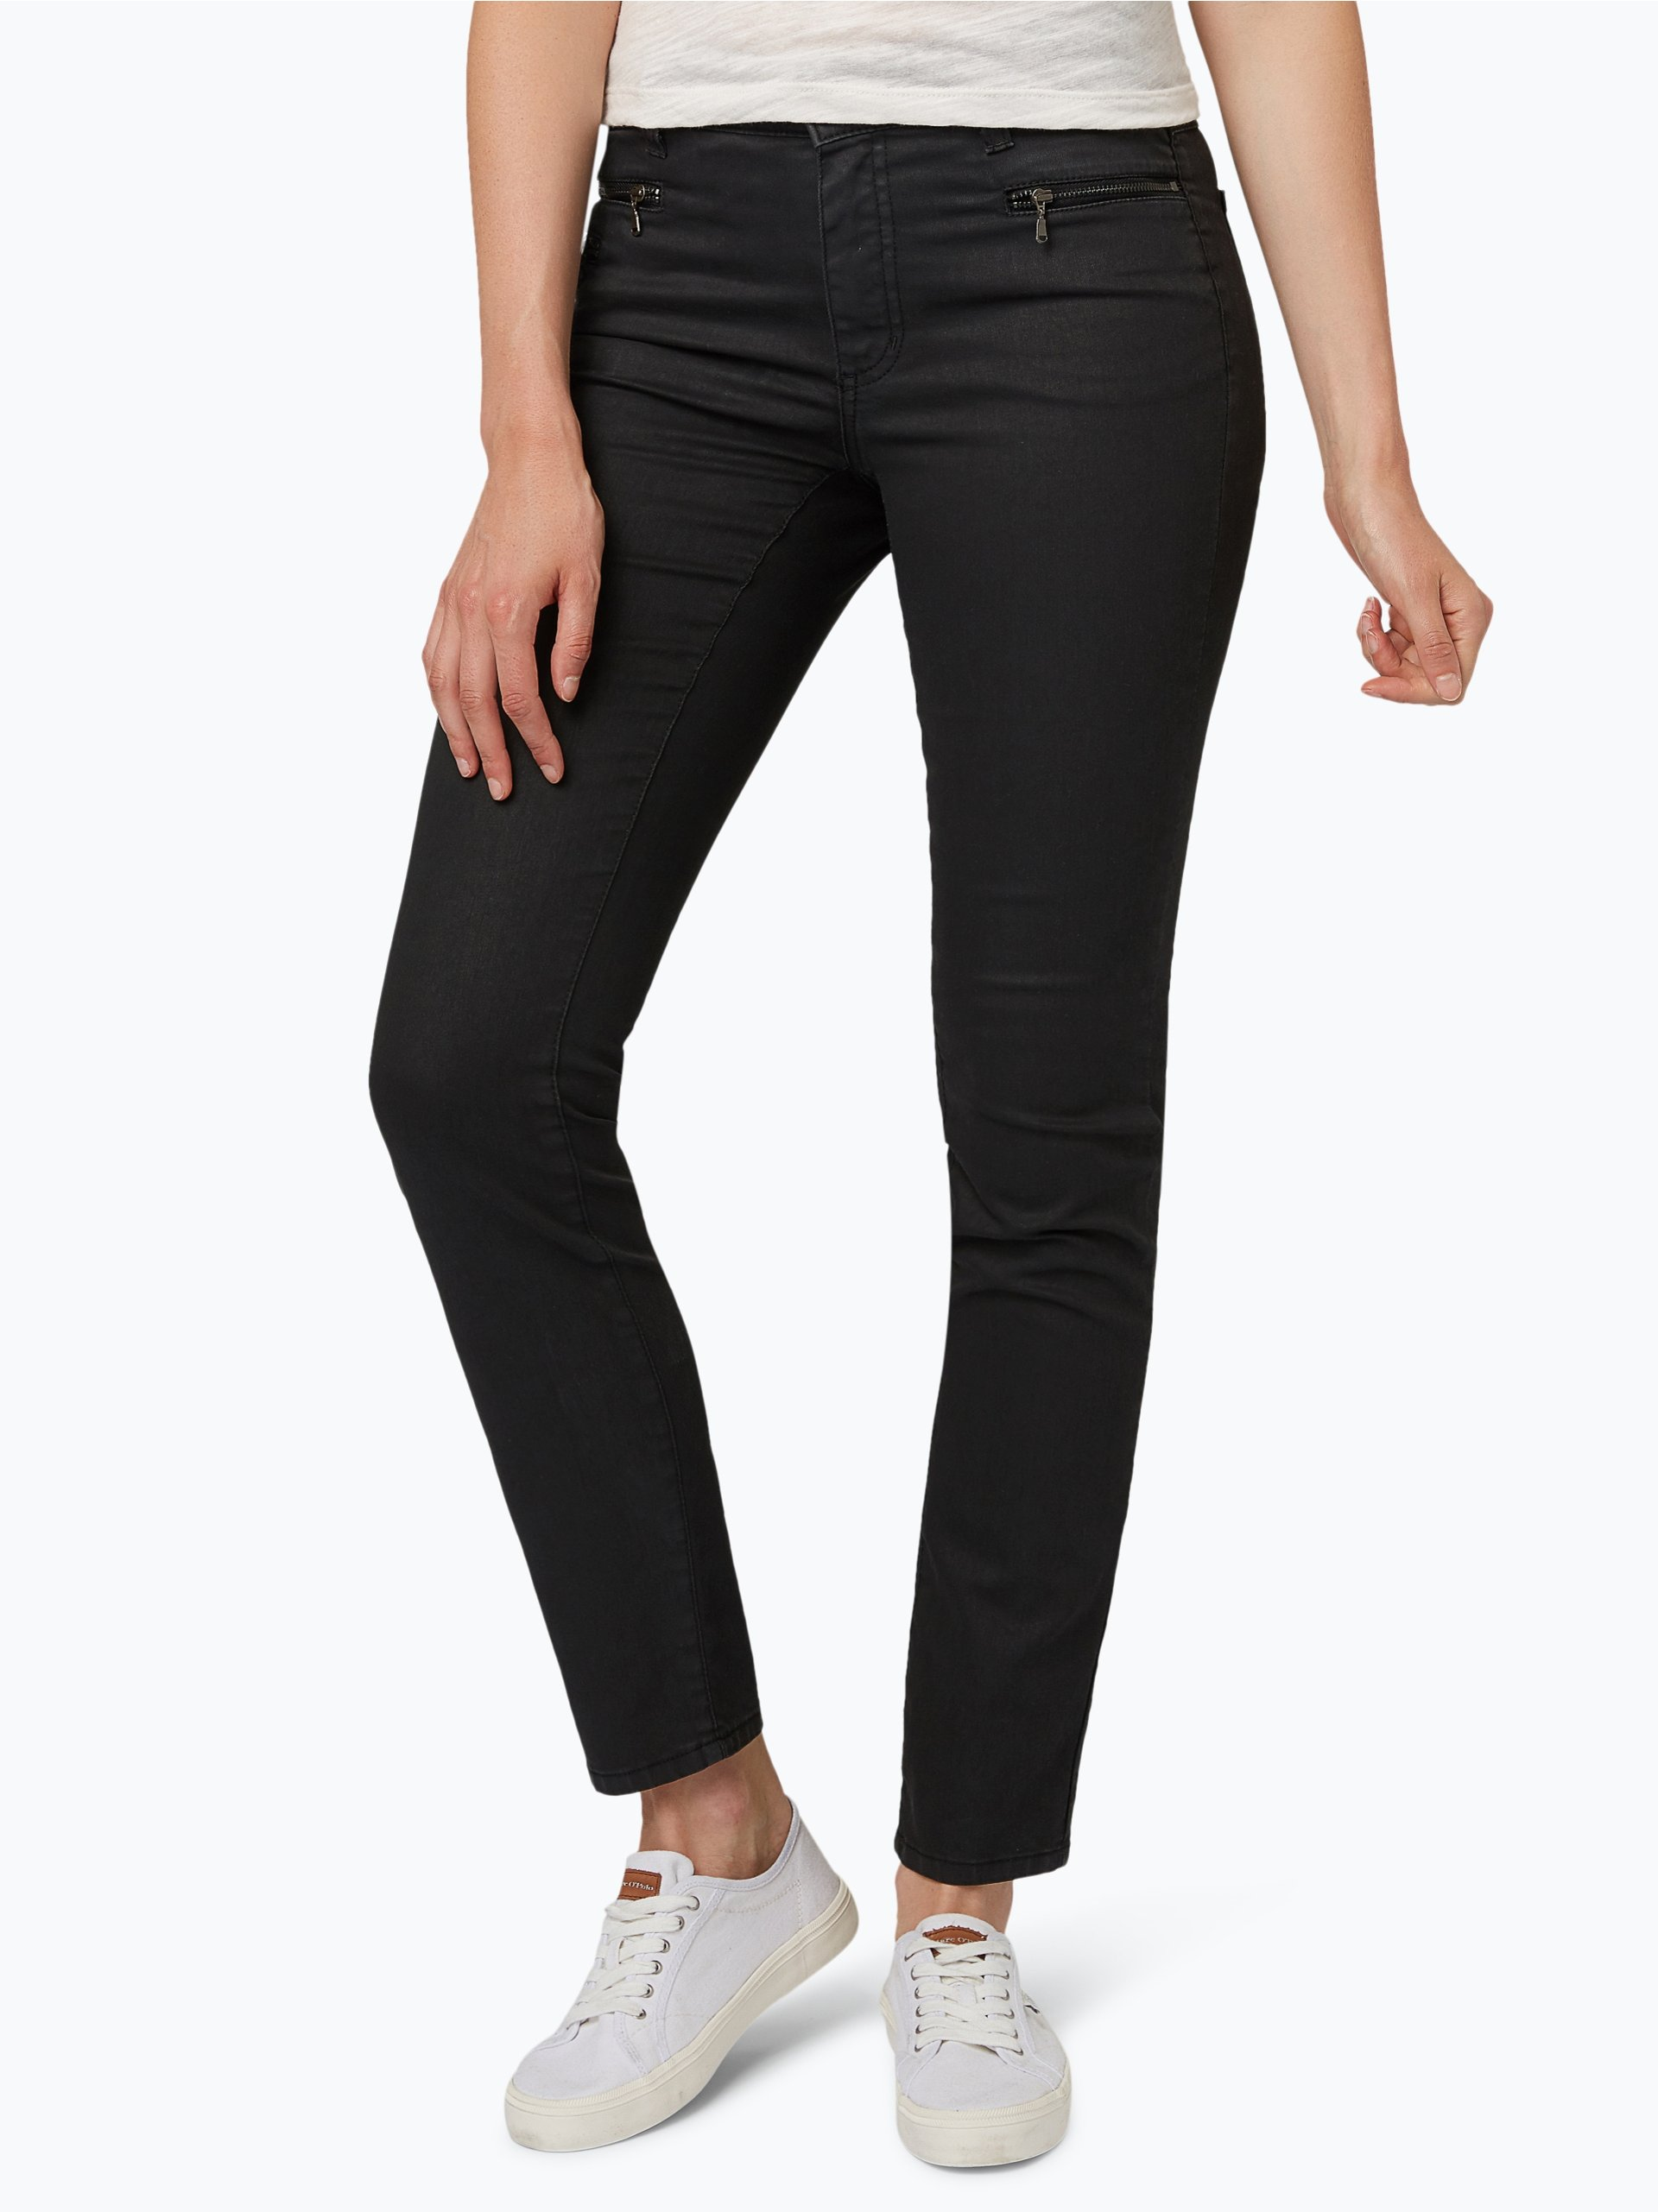 angels damen jeans malu rv schwarz uni online kaufen. Black Bedroom Furniture Sets. Home Design Ideas